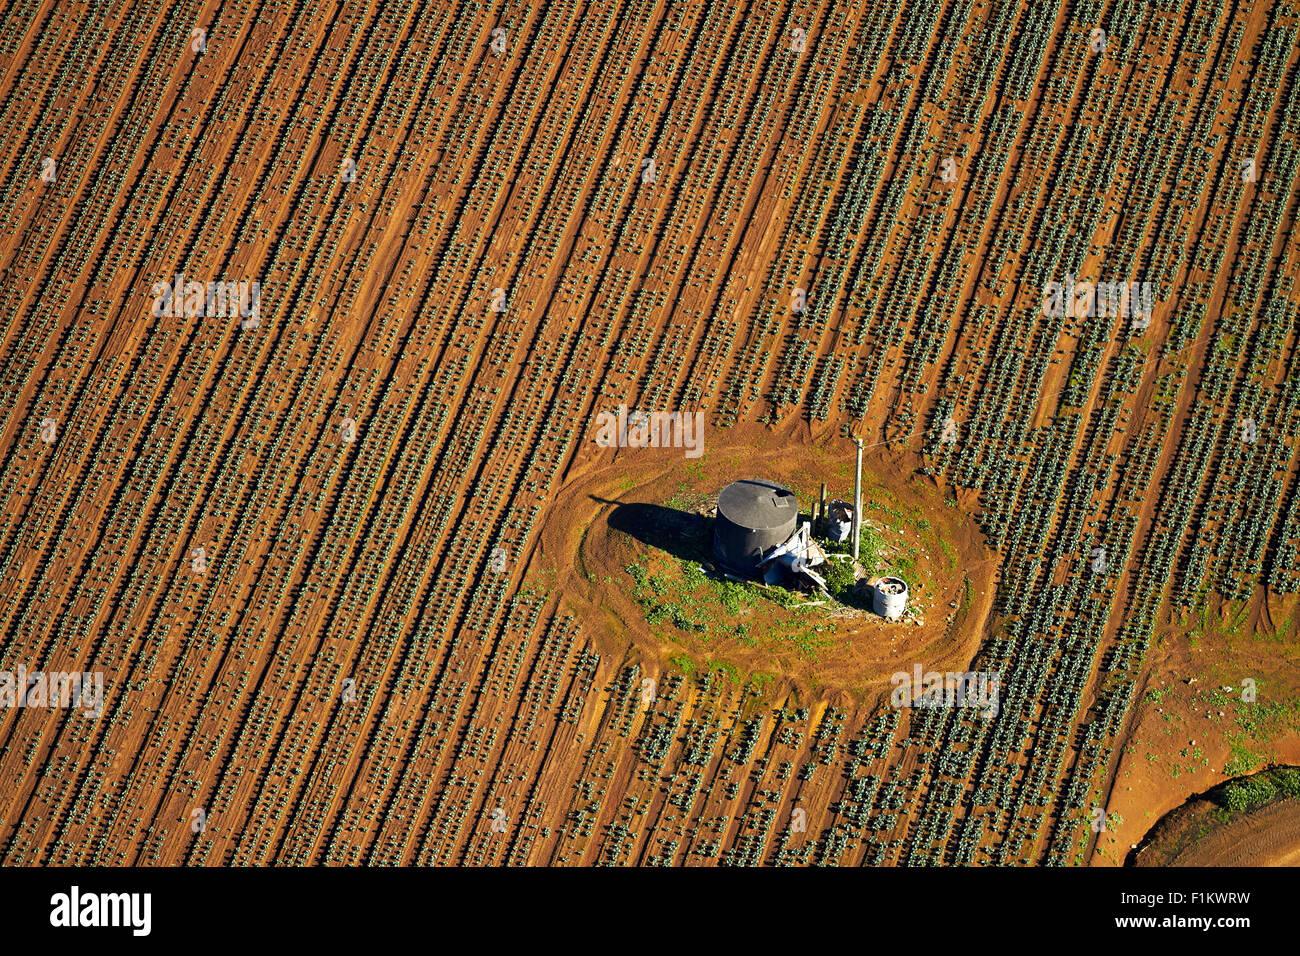 Colture vegetali, Bombay Hills, South Auckland, Isola del nord, Nuova Zelanda - aerial Immagini Stock